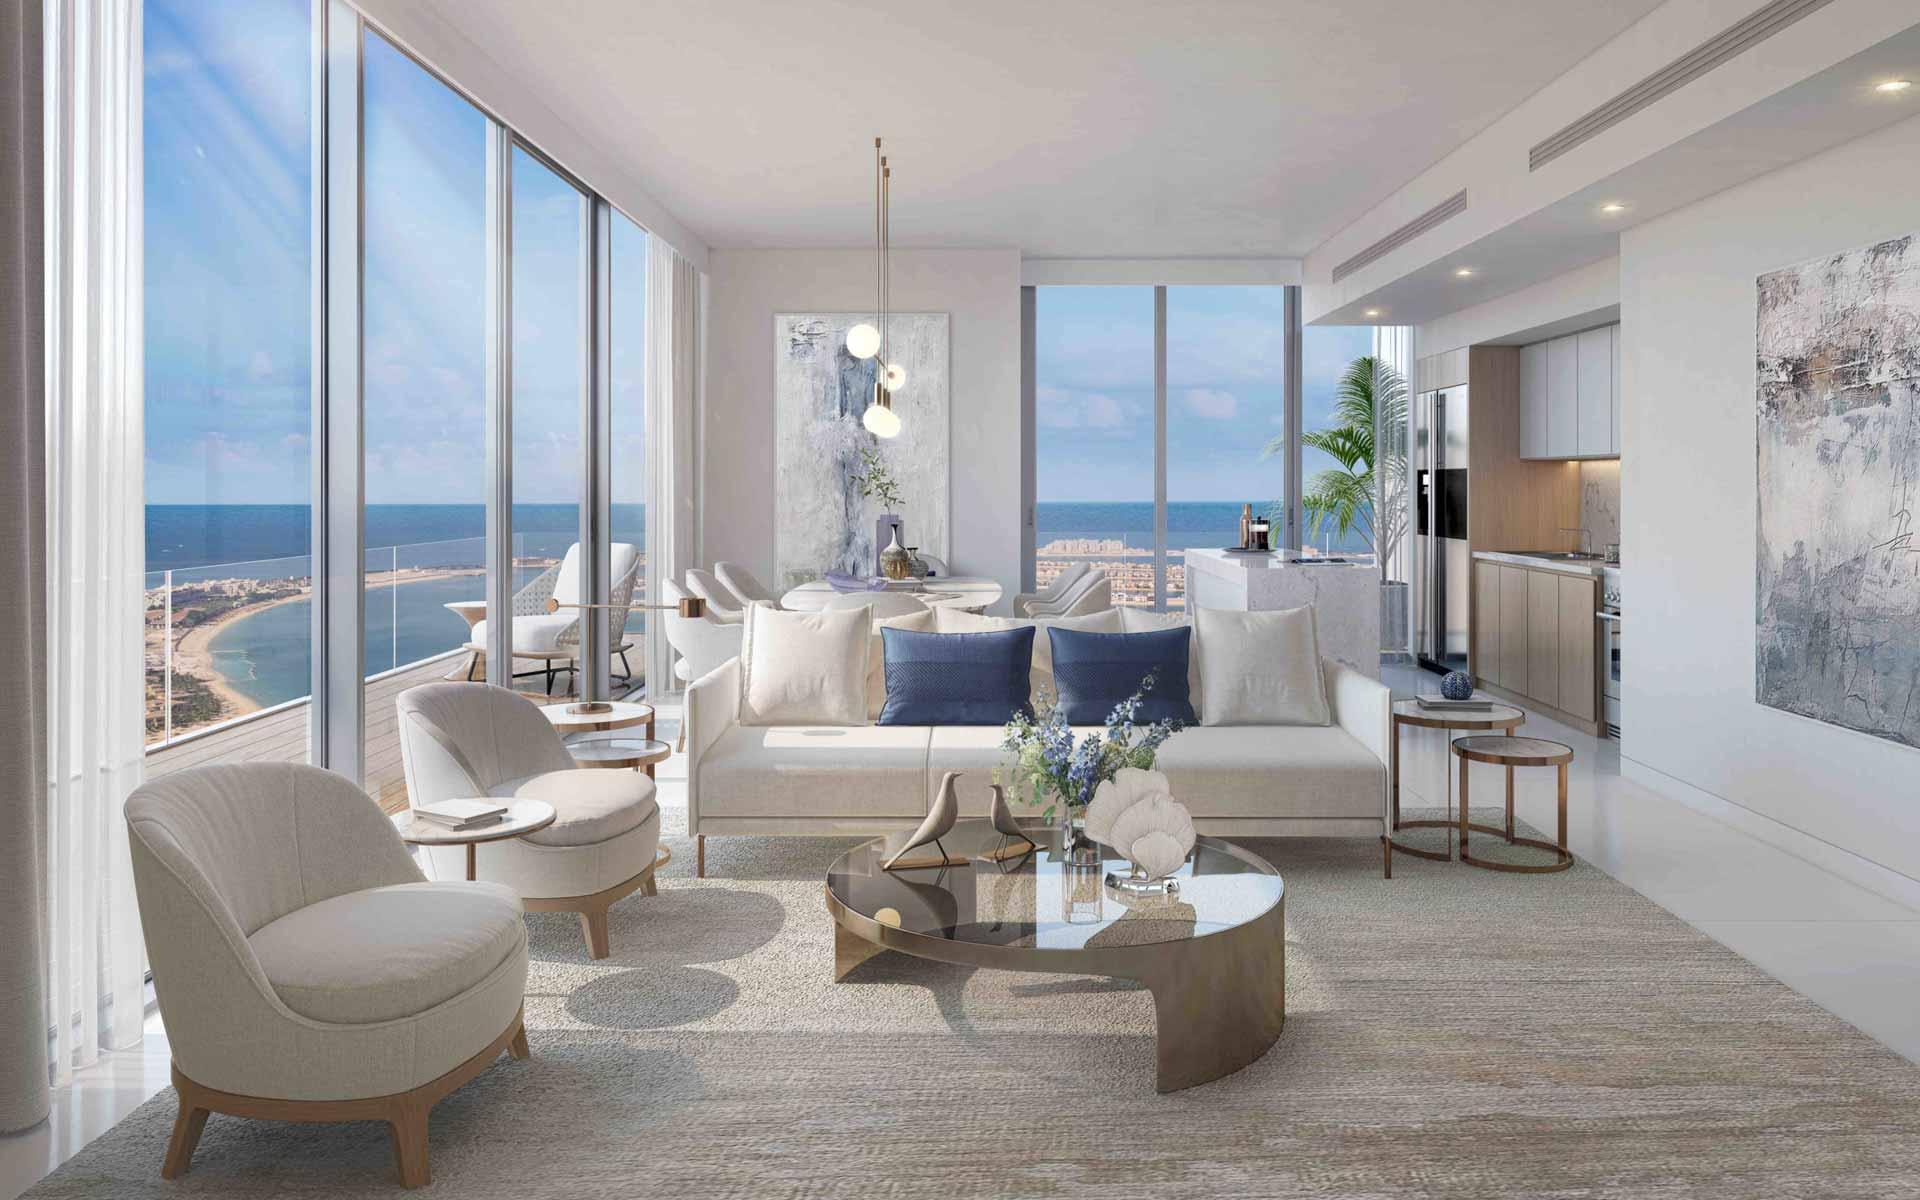 apartment-with-private-beach-access-in-beach-isle